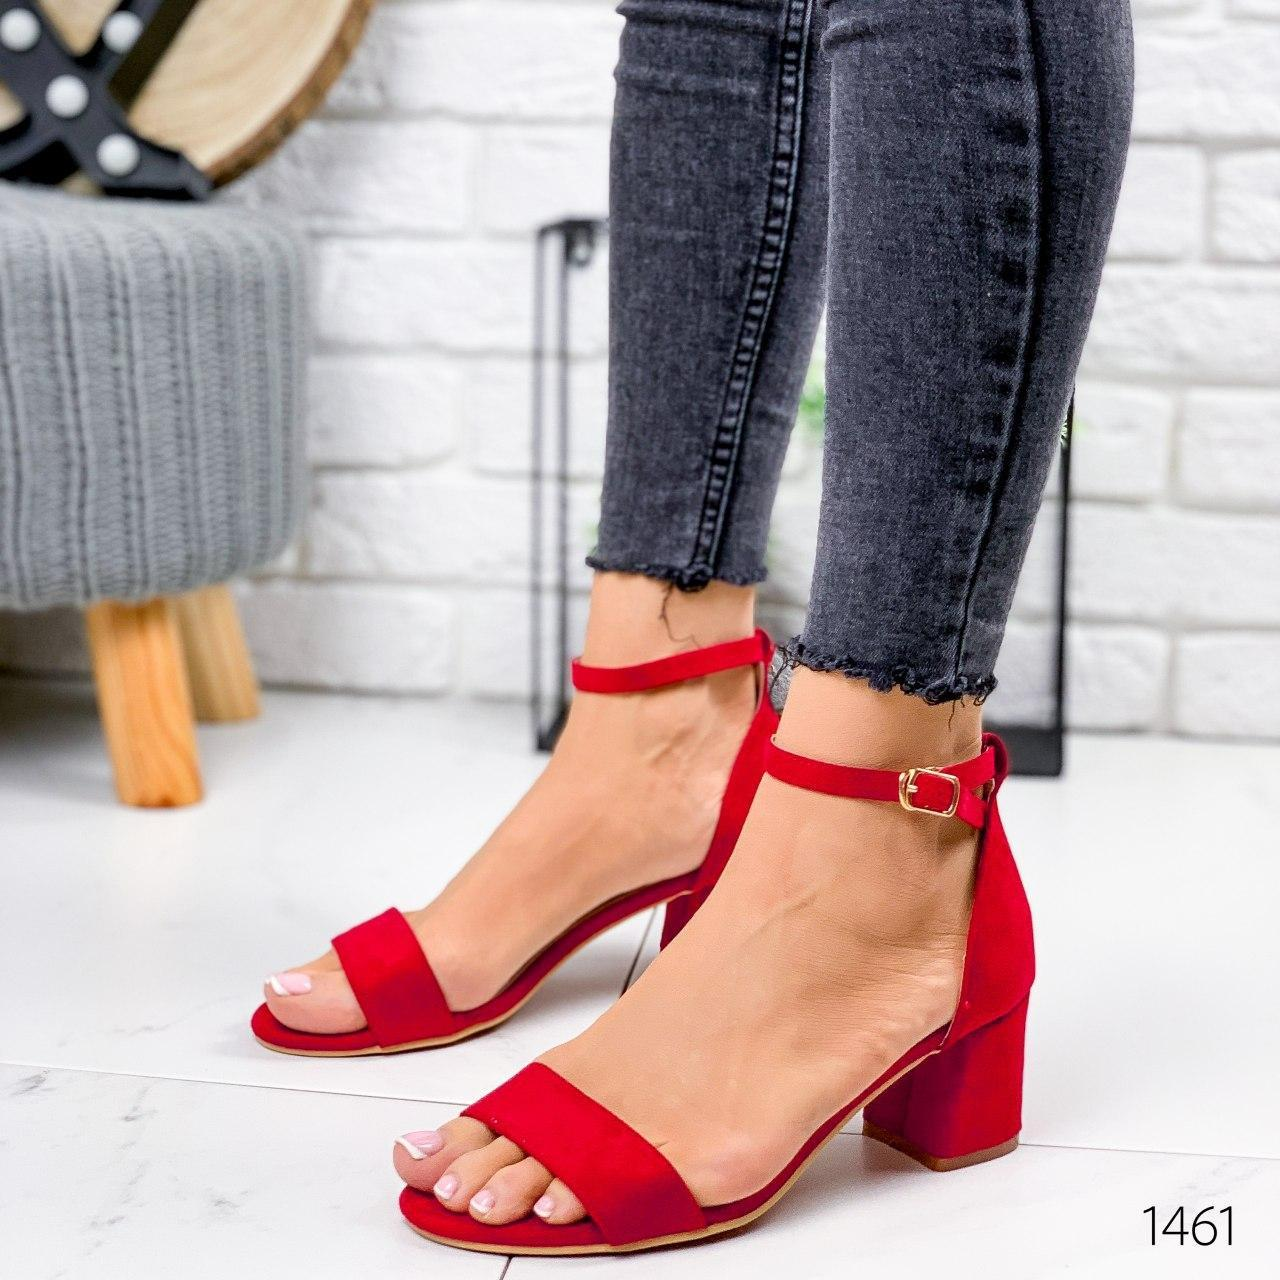 Босоножки женские красные на каблуке. Босоножки женские из эко замши. Босоніжки жіночі